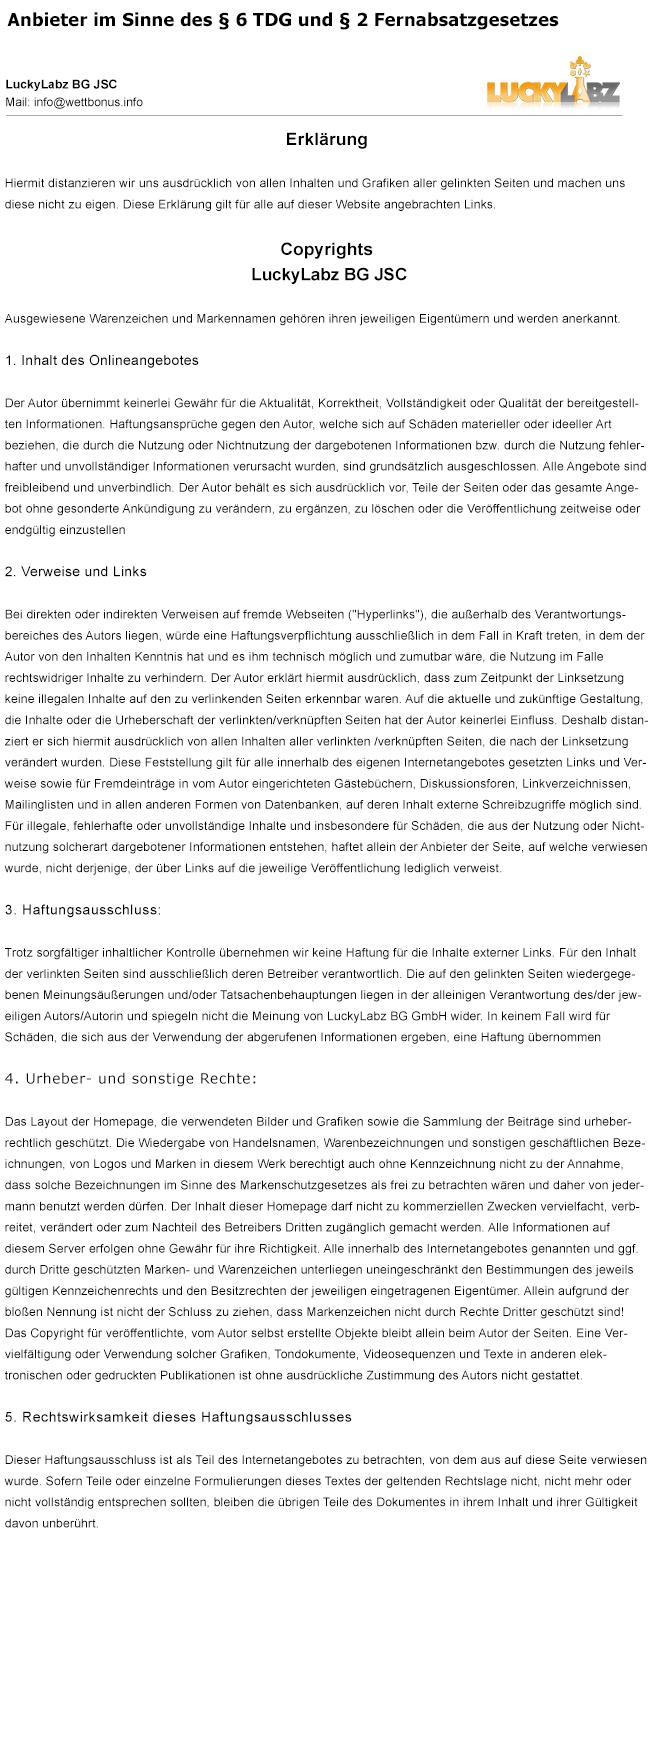 wettbonus-info